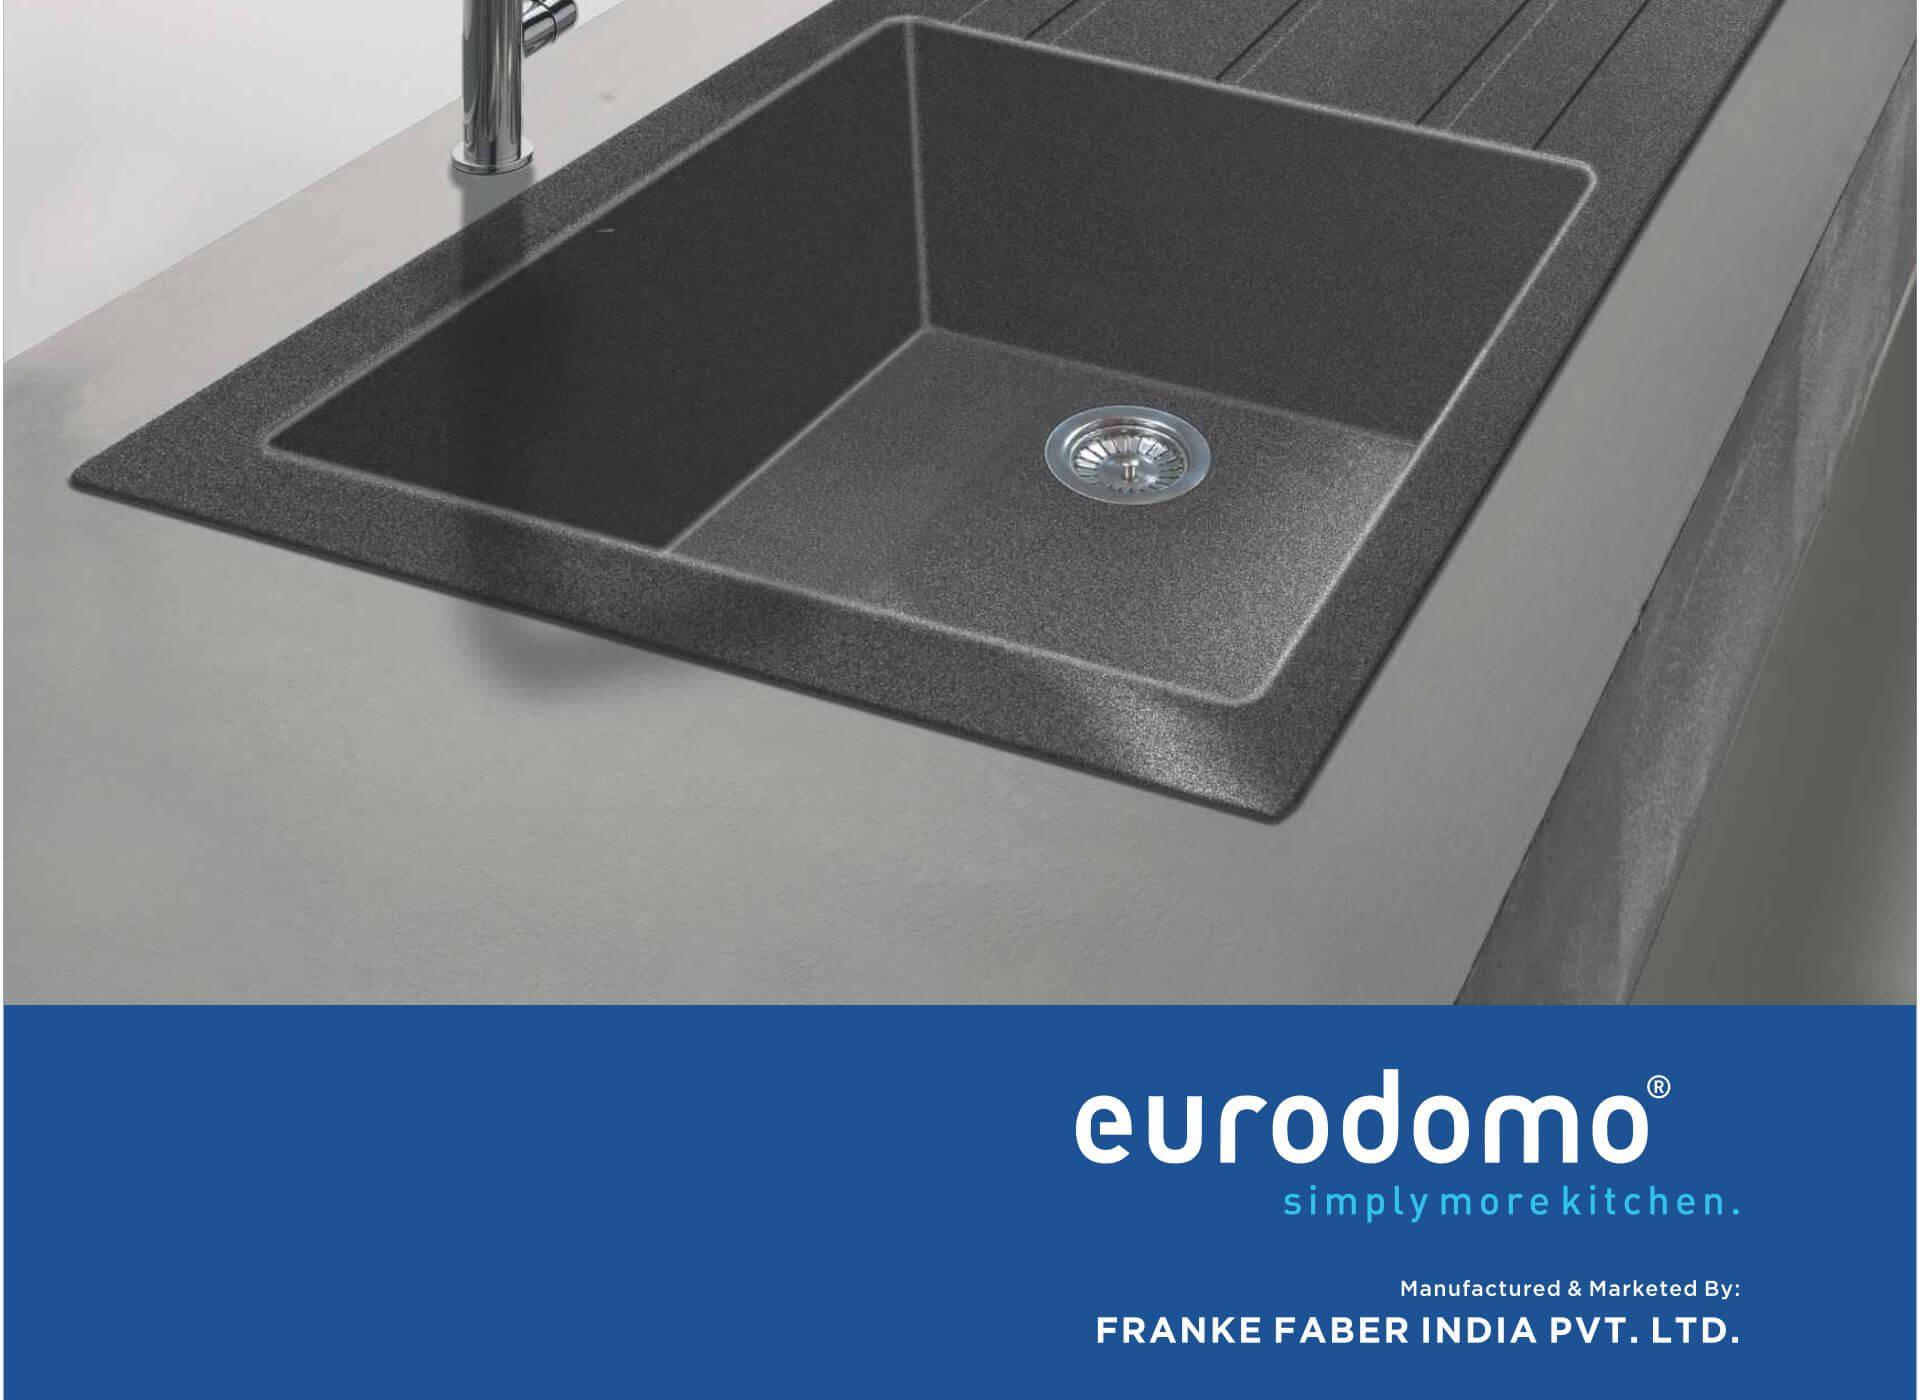 Eurodomo-Sink-page-4.jpg